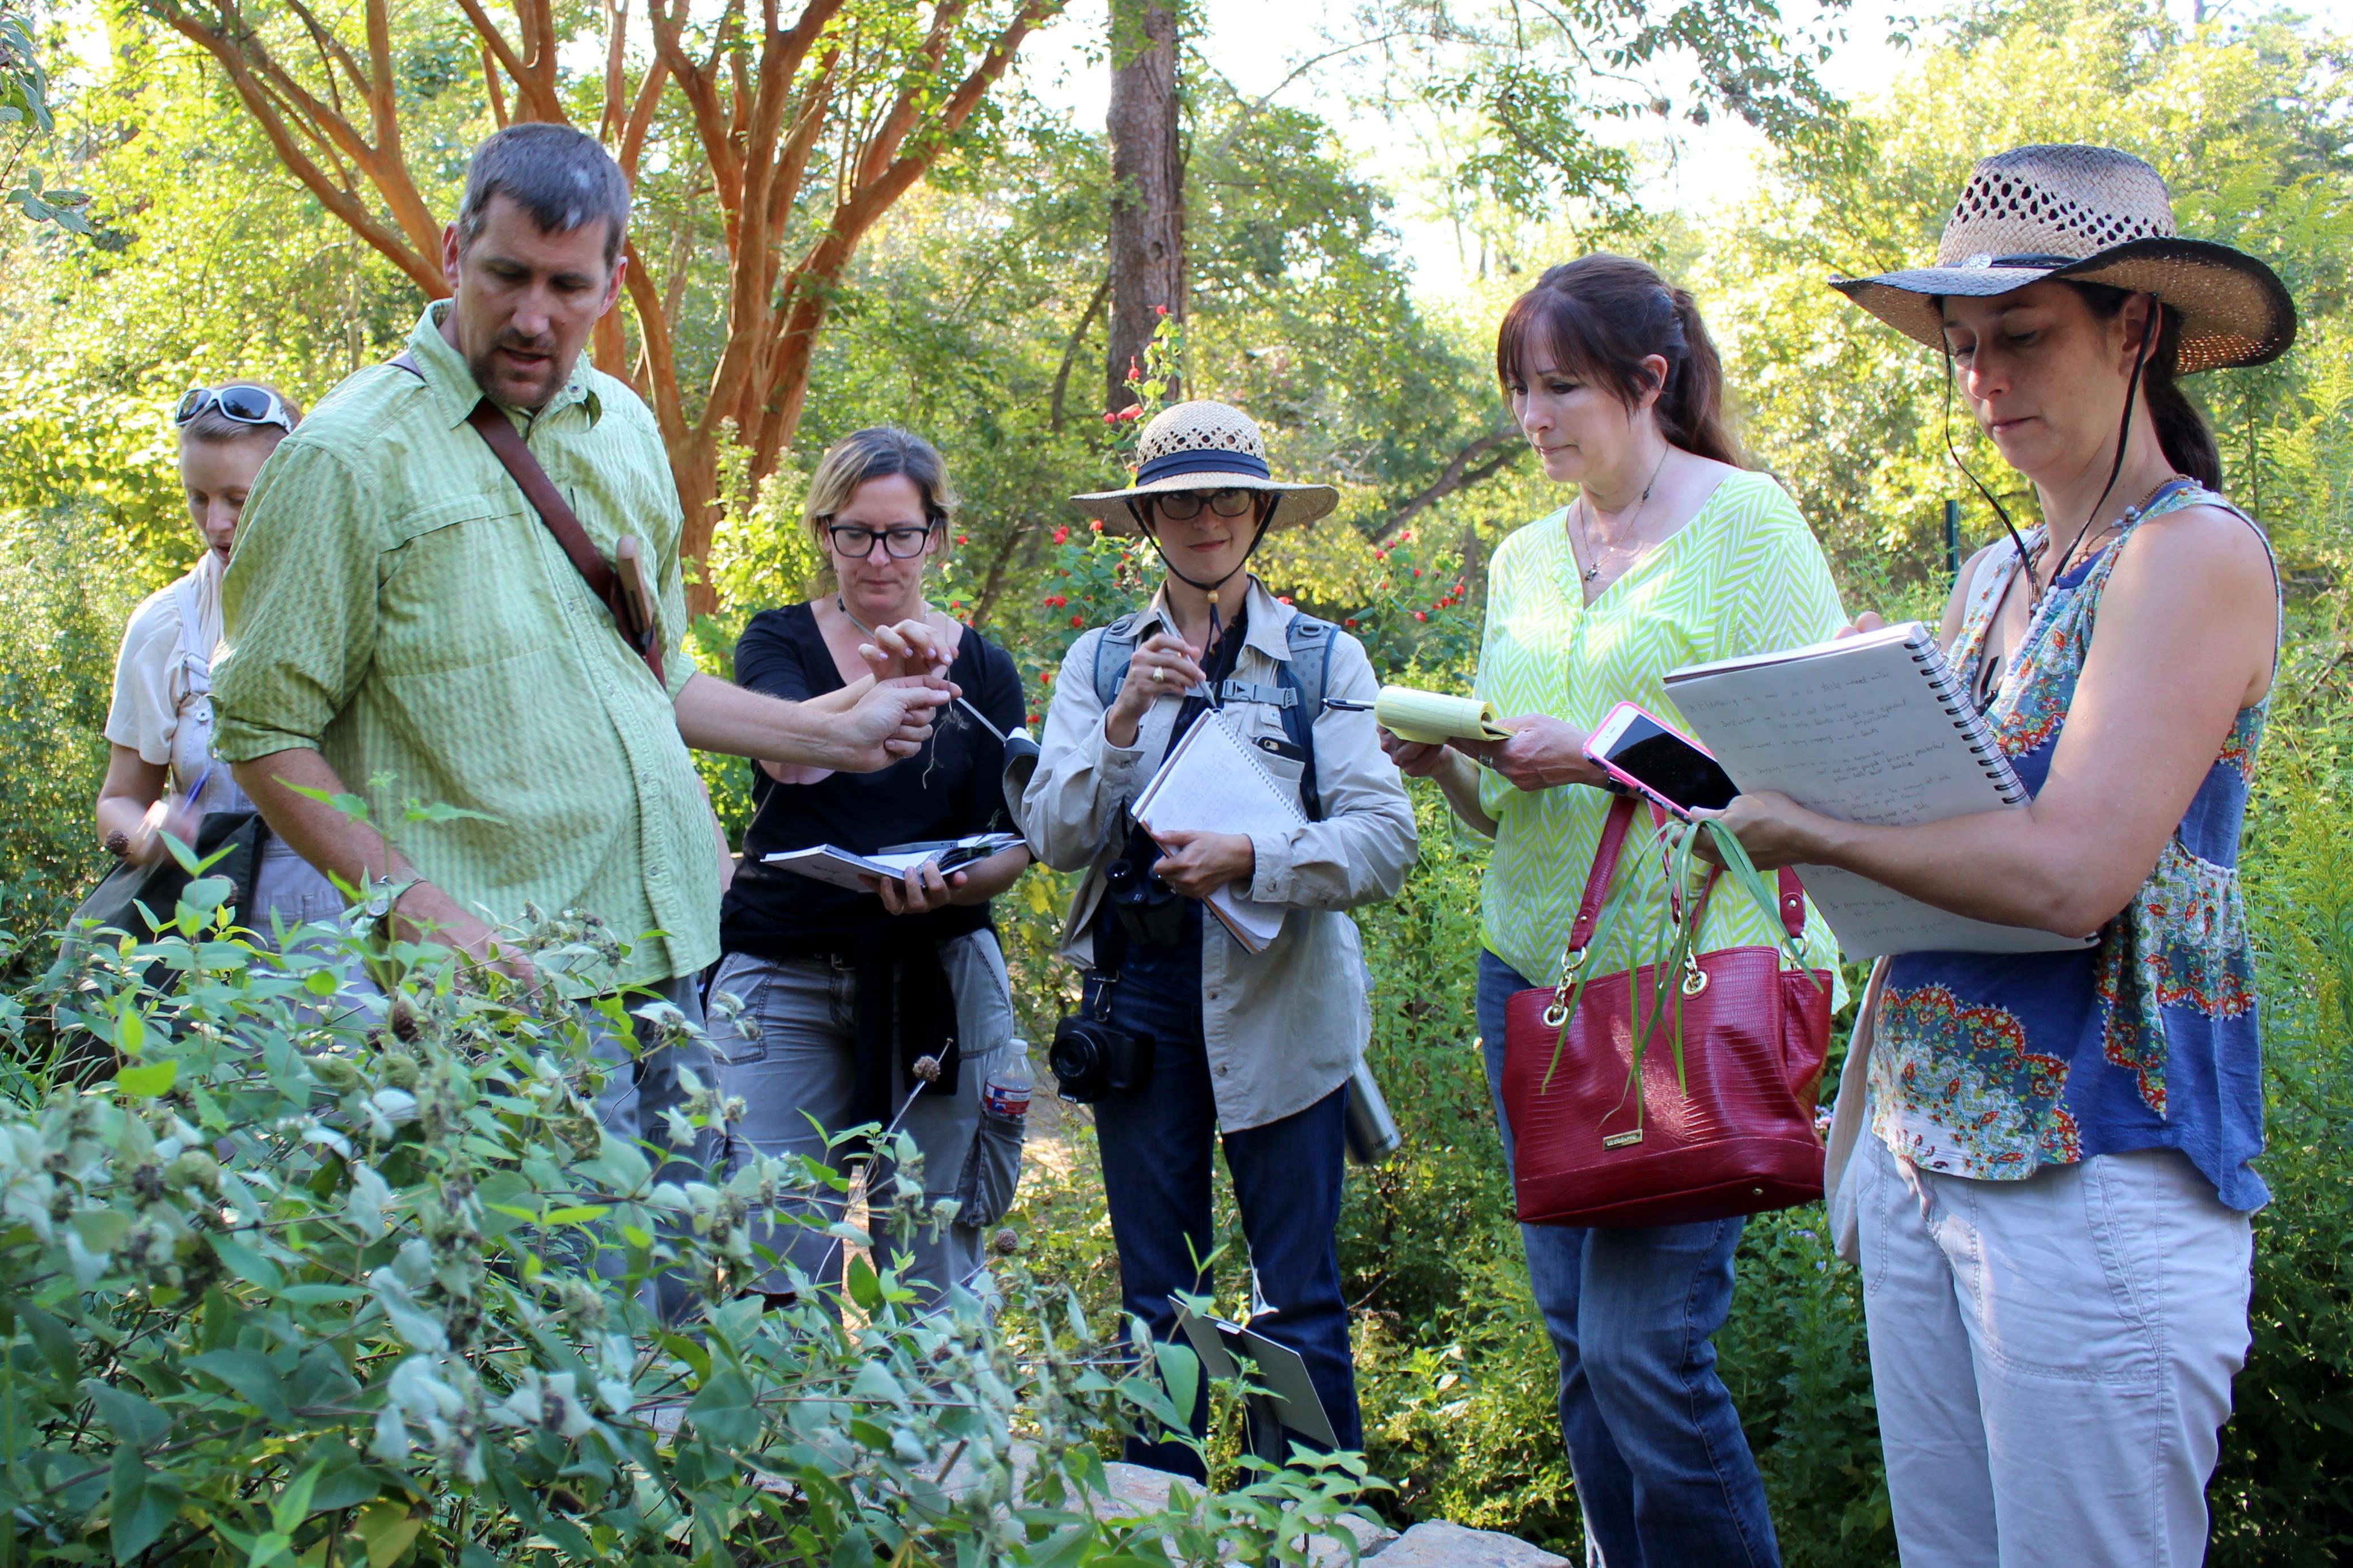 Edible wild plants  photo credit kelsey low ql5wvx